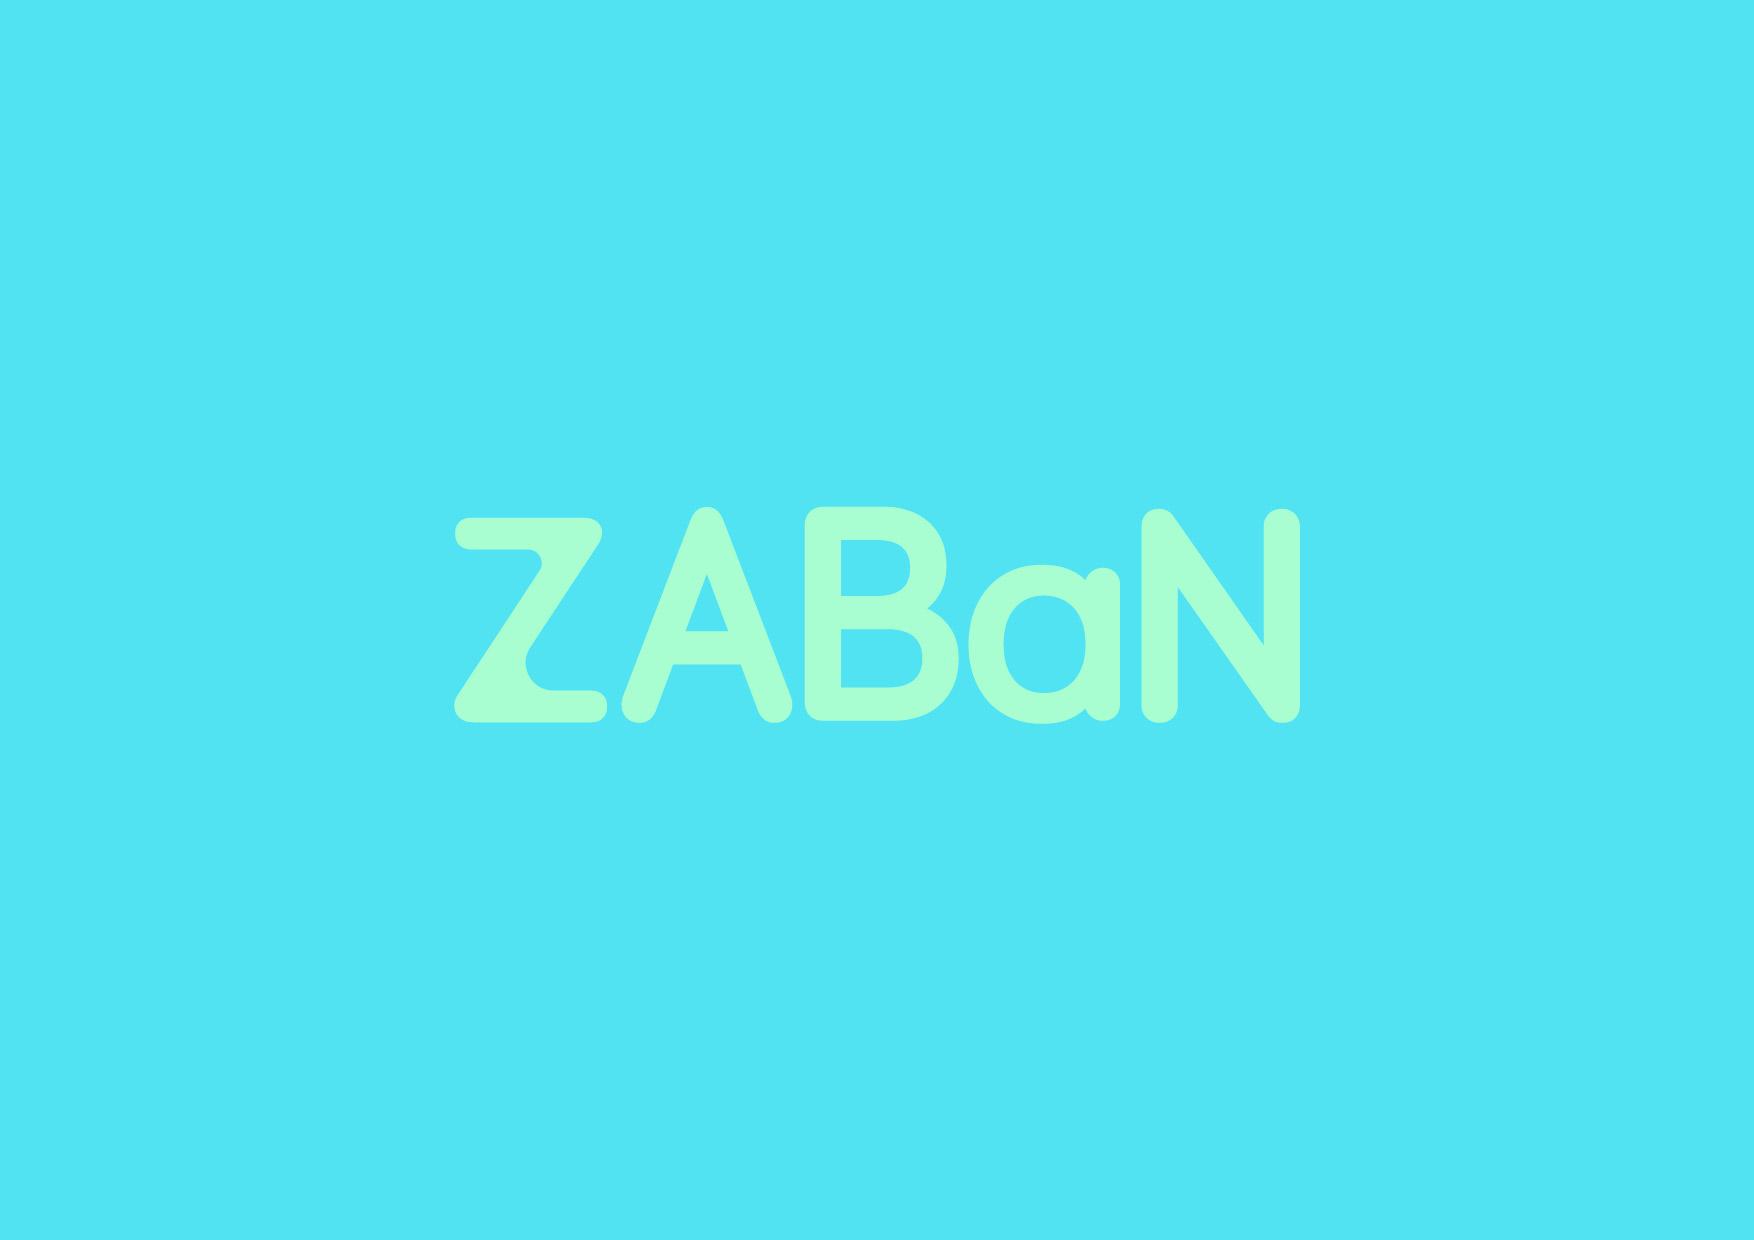 170404_zaban_logo pre-4